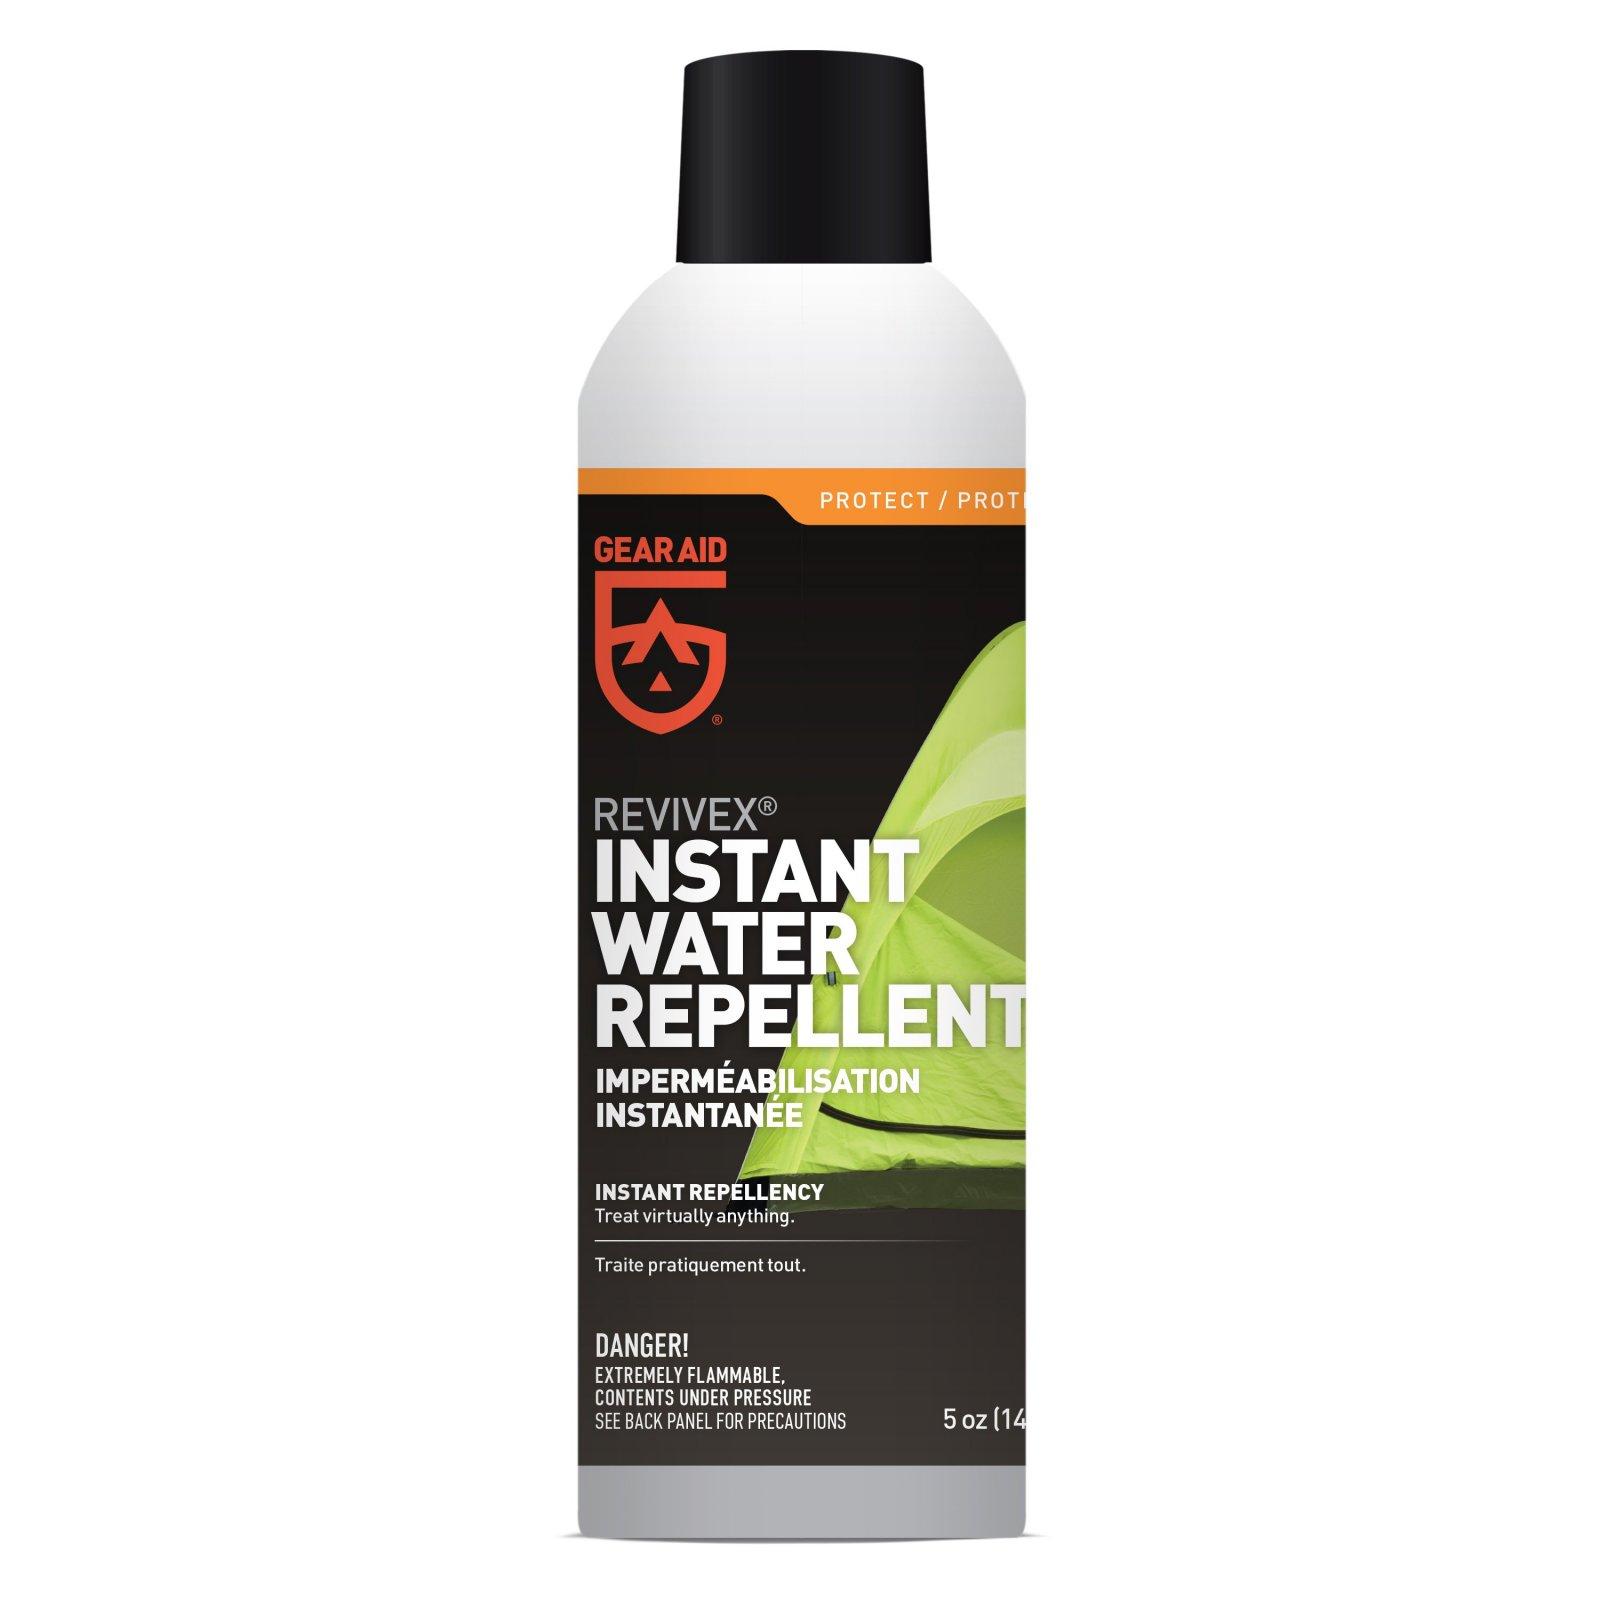 ReviveX Instant Water Repellent Aerosol Spray